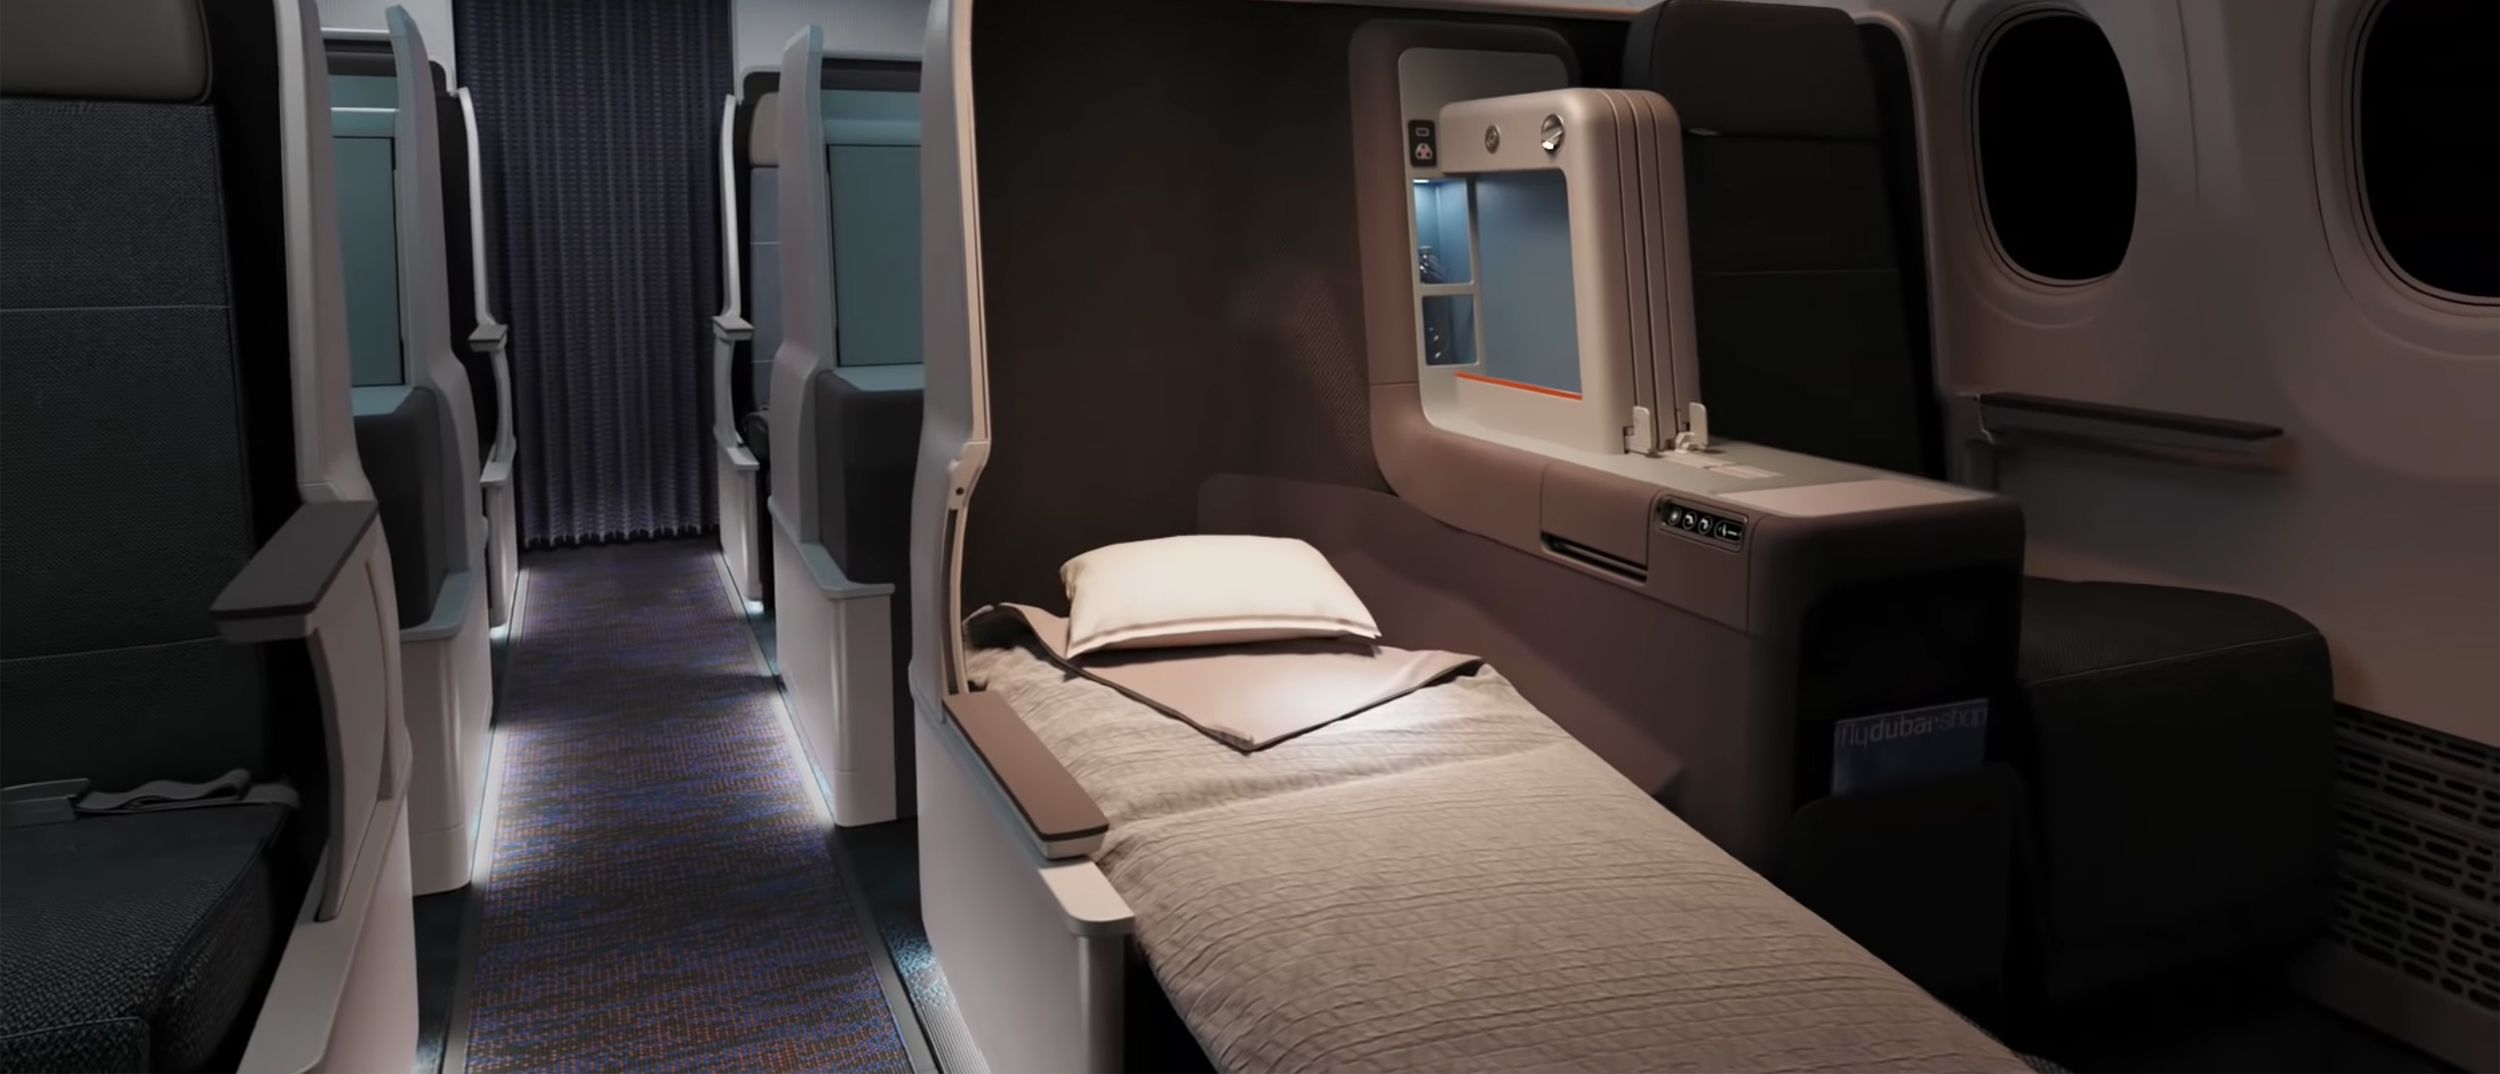 flydubai 737 MAX Biz 2 (flydubai)